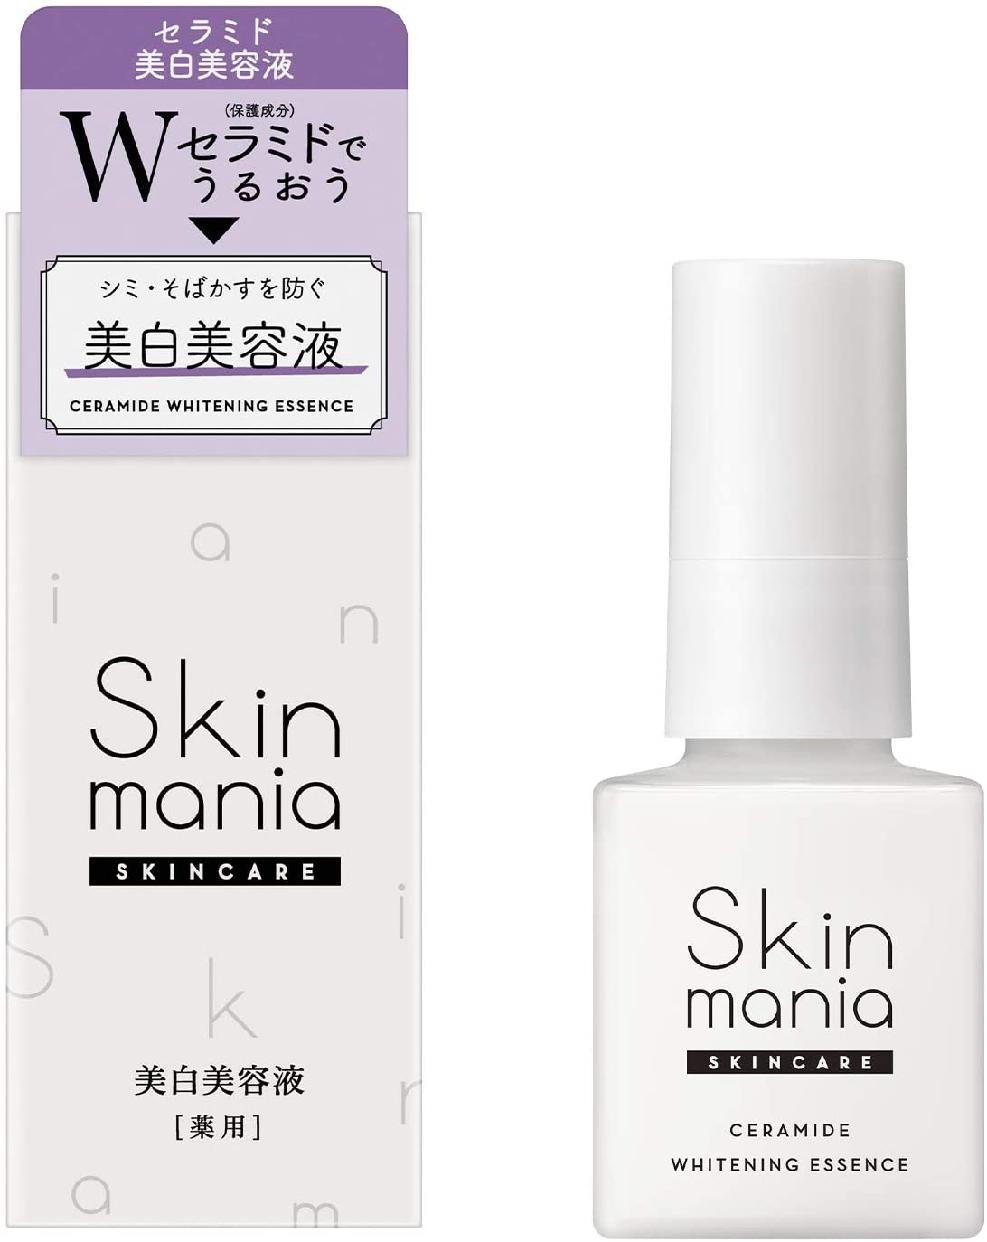 Skin mania(スキンマニア)セラミド 美白美容液の商品画像